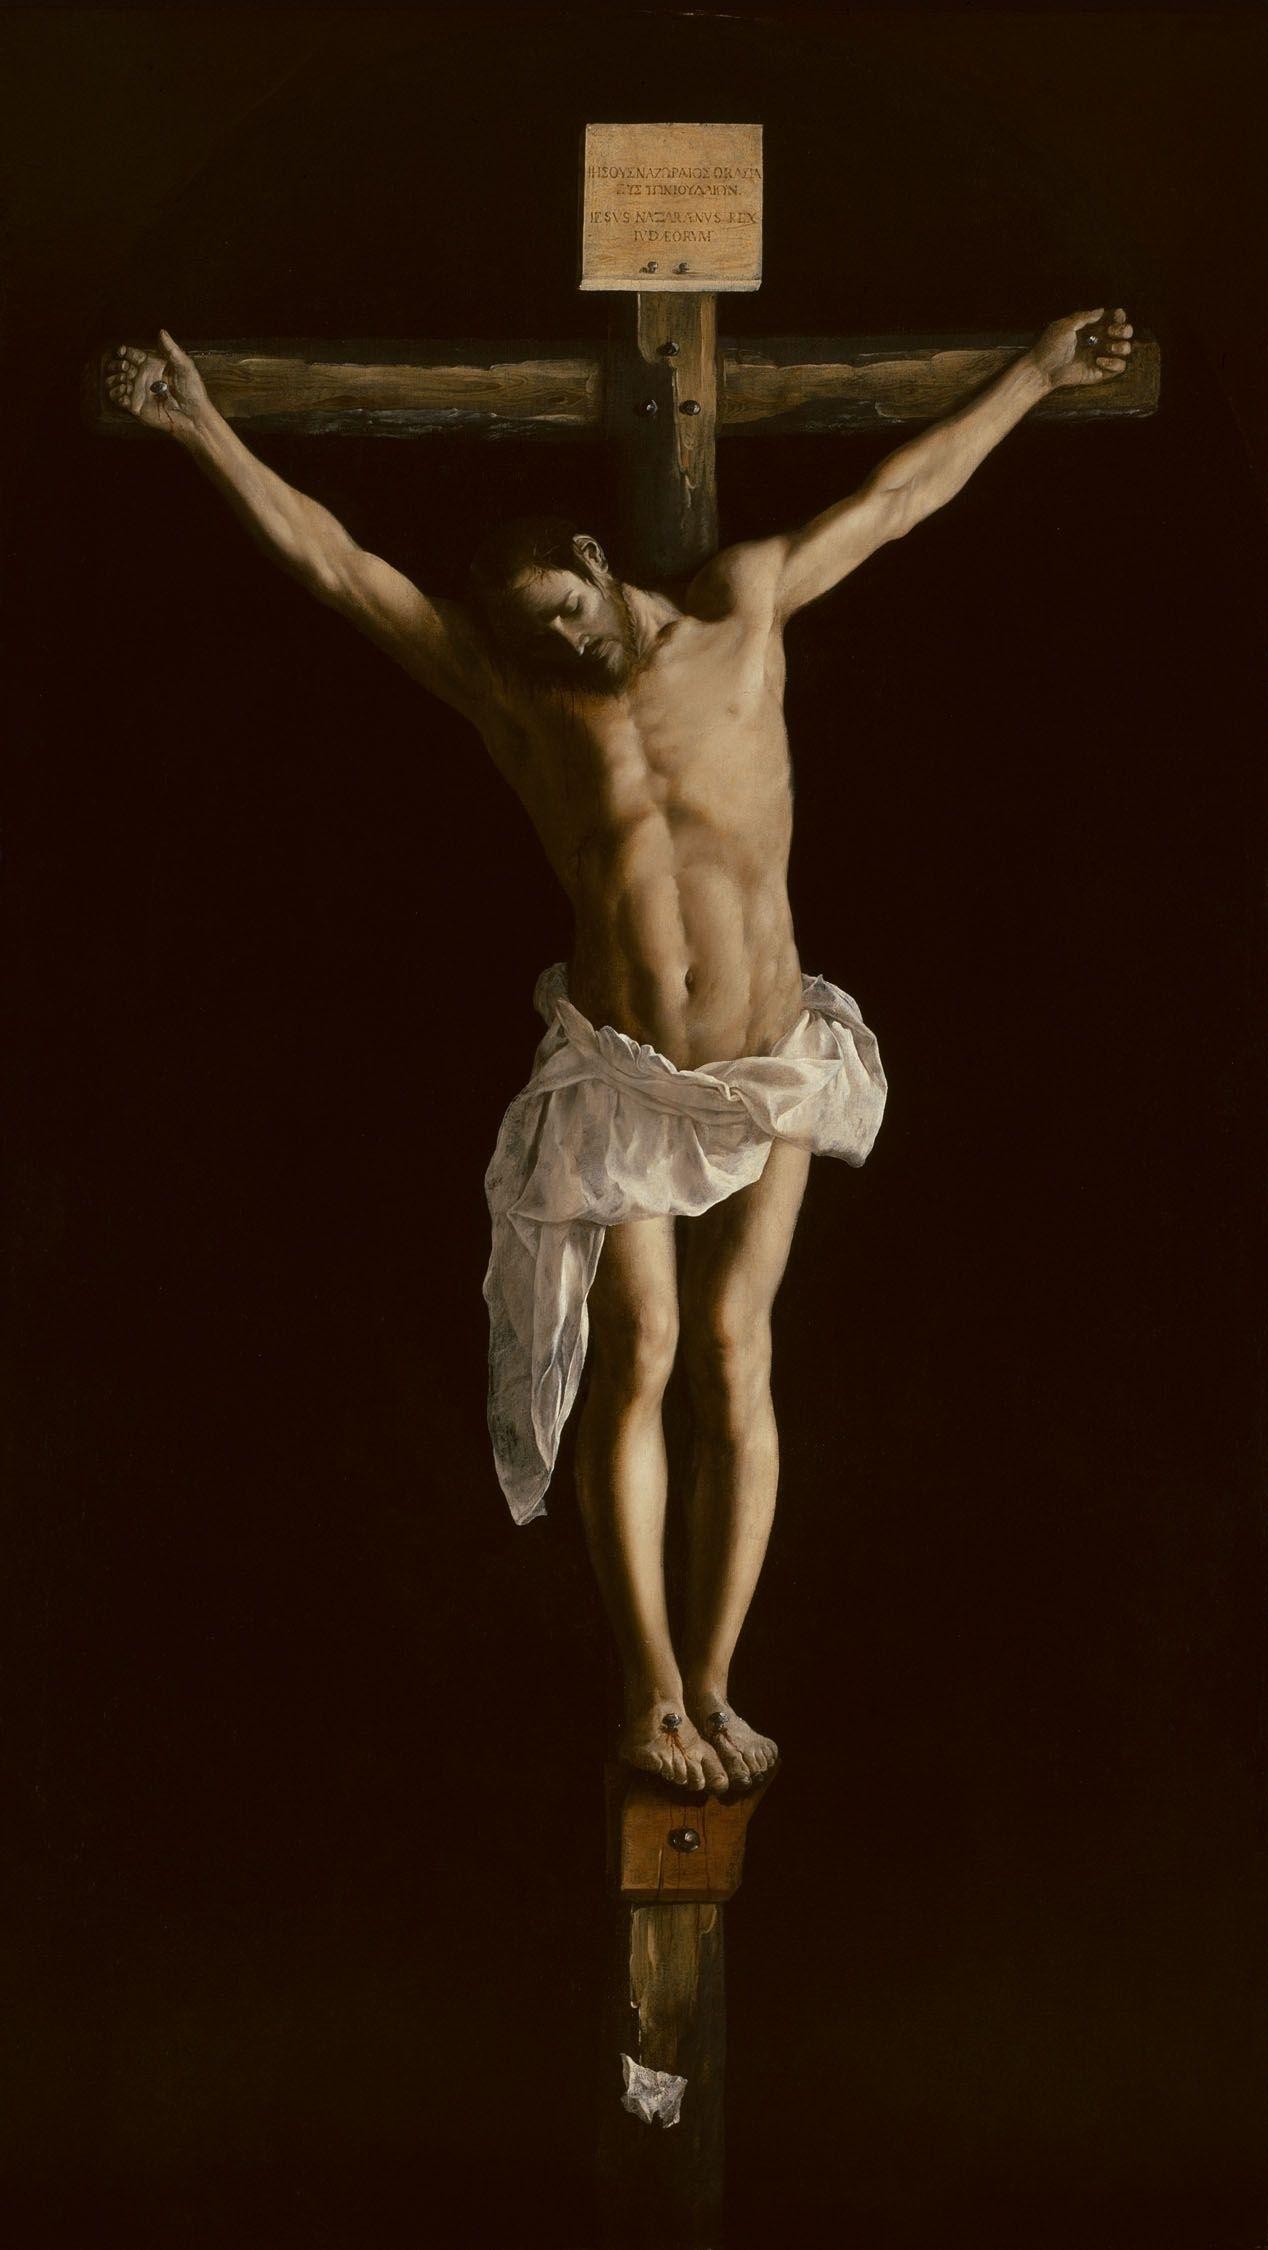 file:francisco de zurbarán - christ on the cross - wga26051